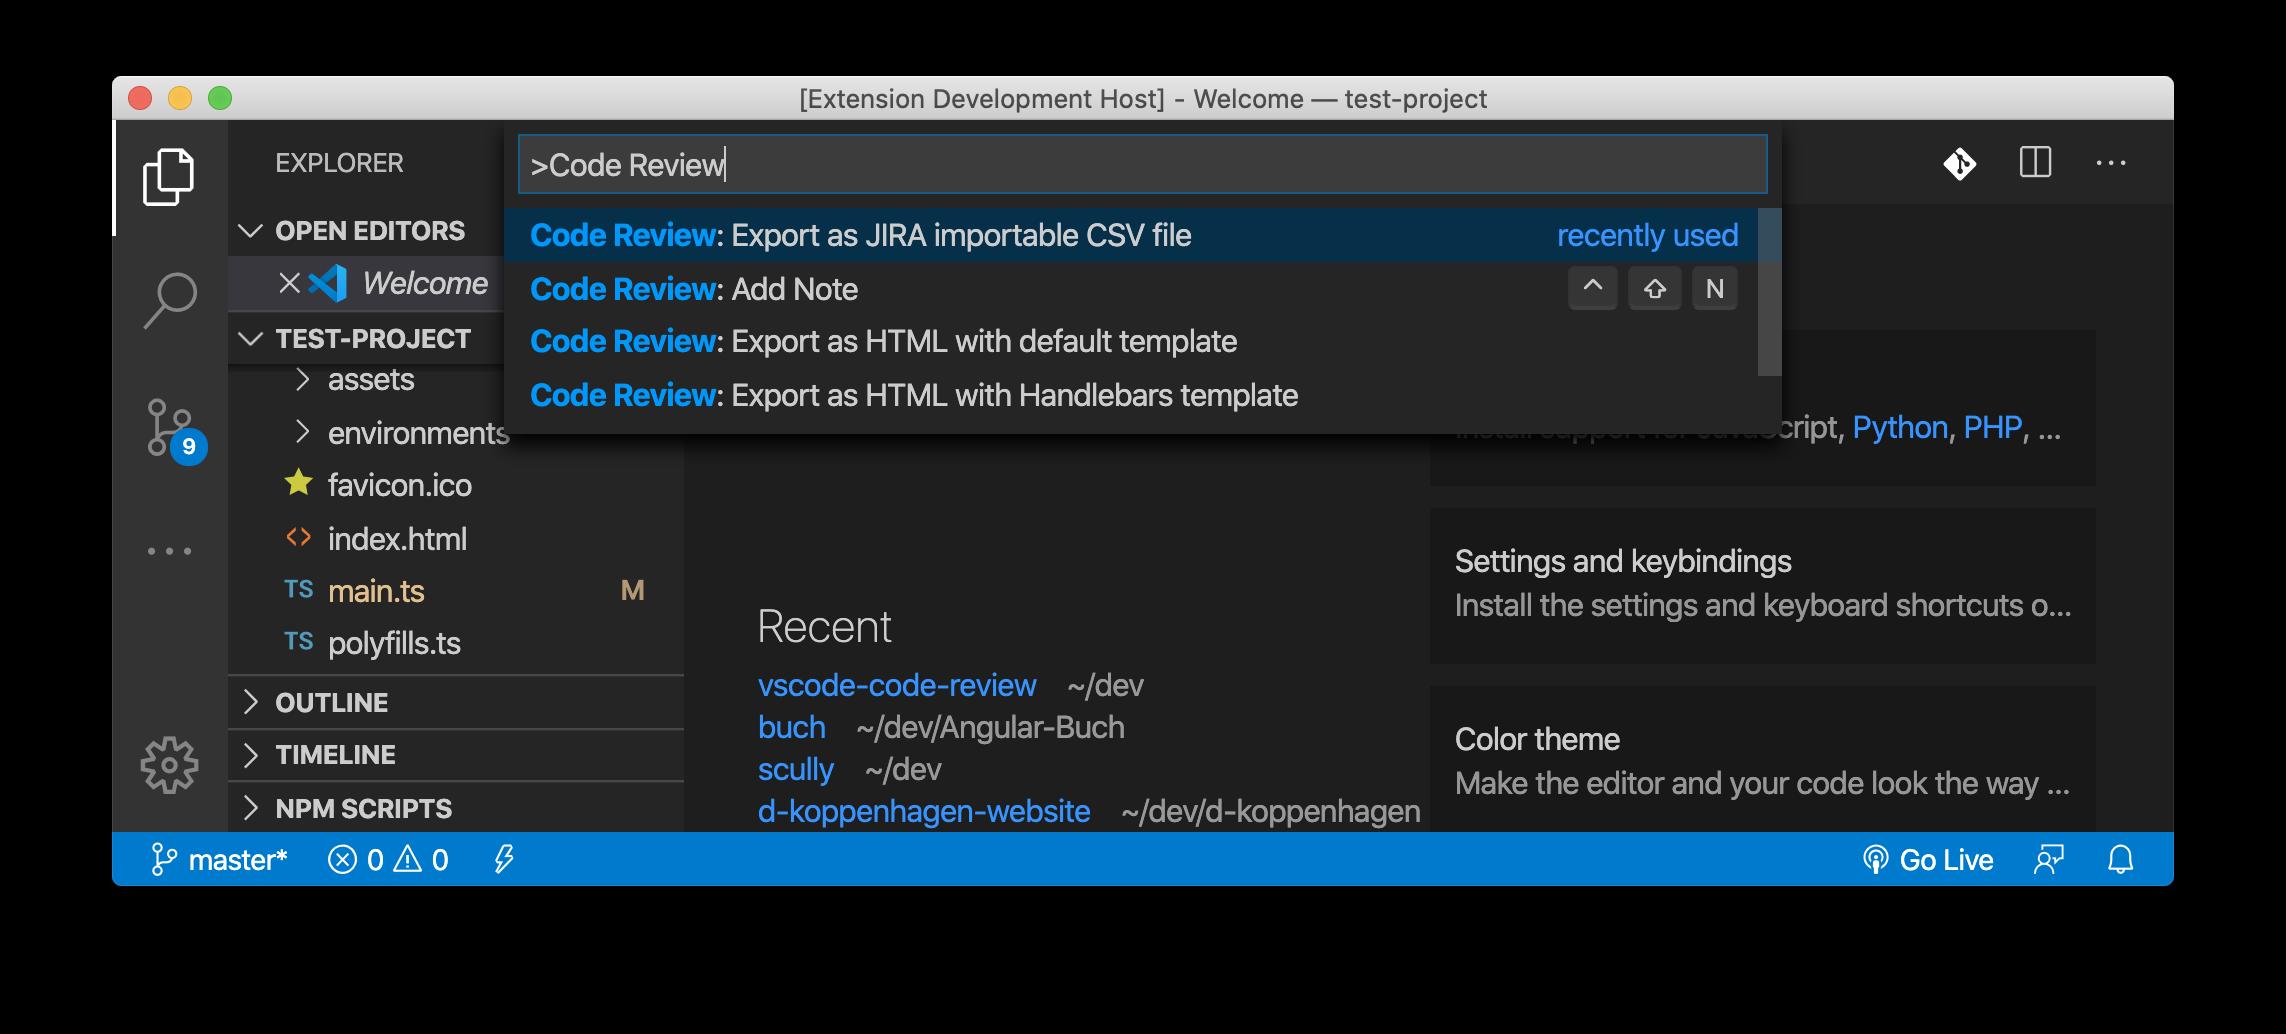 Code Review JIRA importable CSV export